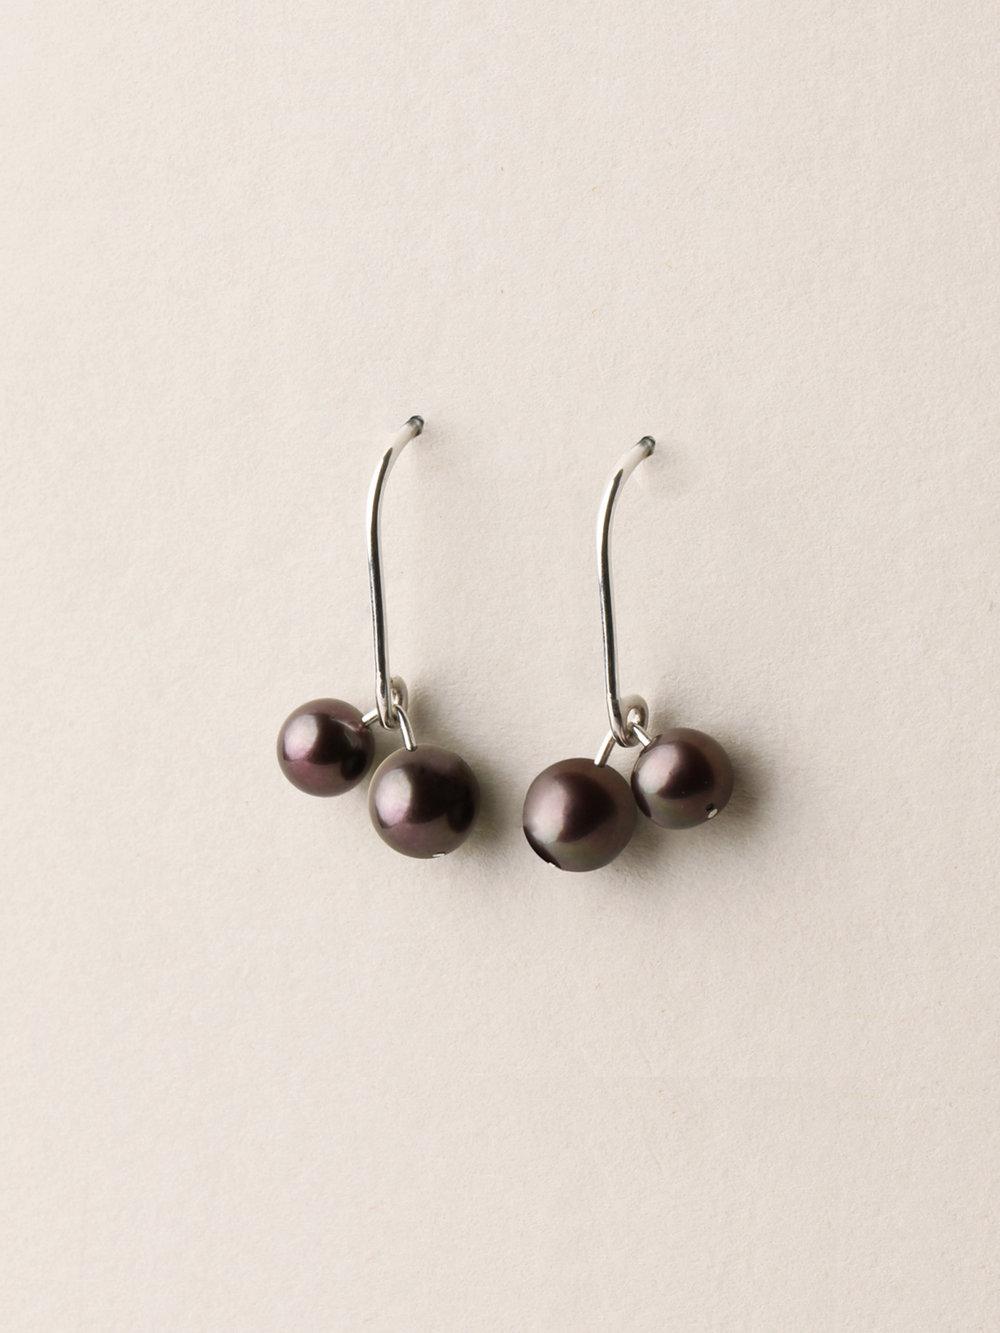 Perlen Ohrhänger, kurz mit 2 Perlen in 925 Silber und echten Süßwasserzuchtperlen/ Pearl earrings, short with 2 pearls in sterling silver and sweetwater pearls